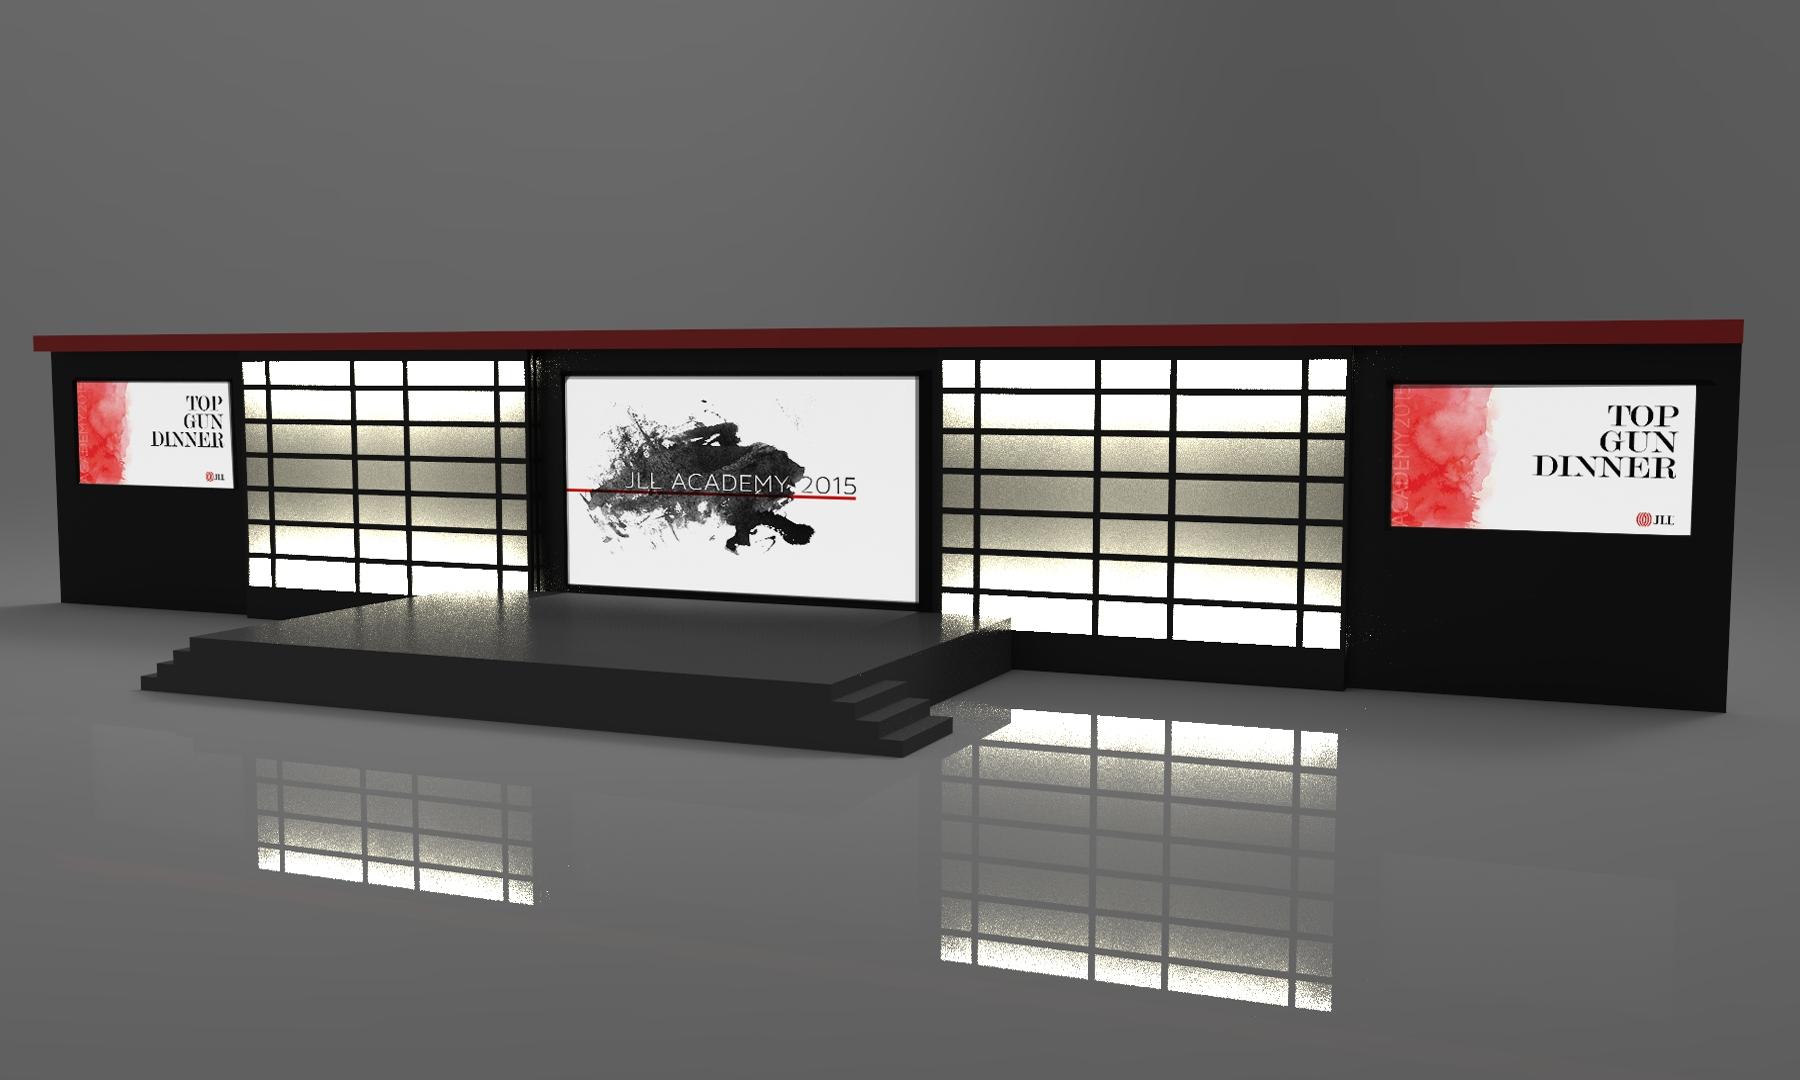 JLL_Shoji-Screen-Wall_Screens.jpg